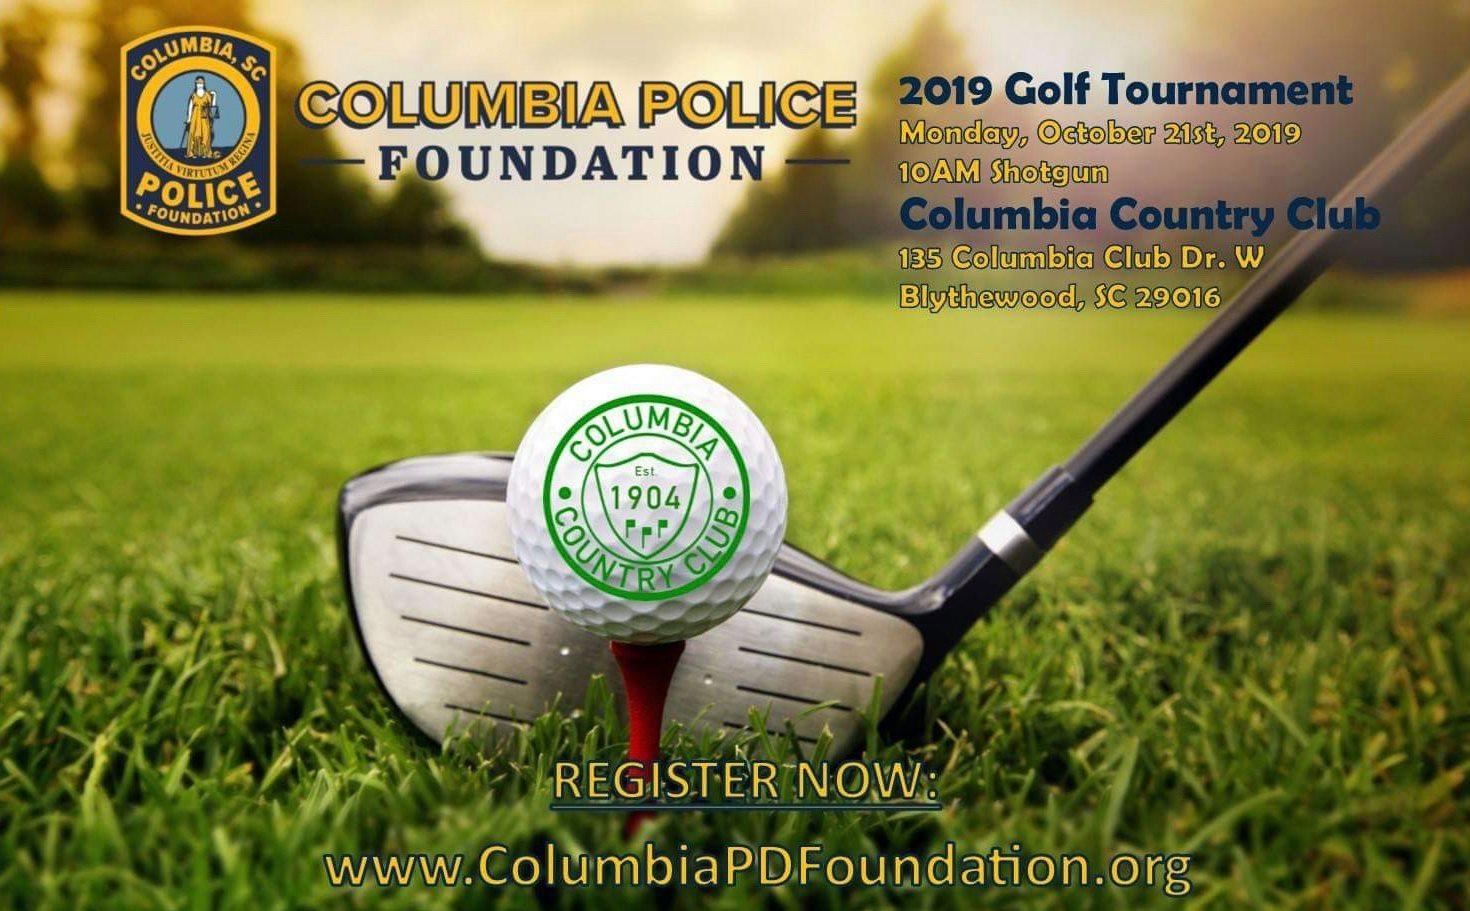 Columbia Police Foundation - 2019 Golf Tournament